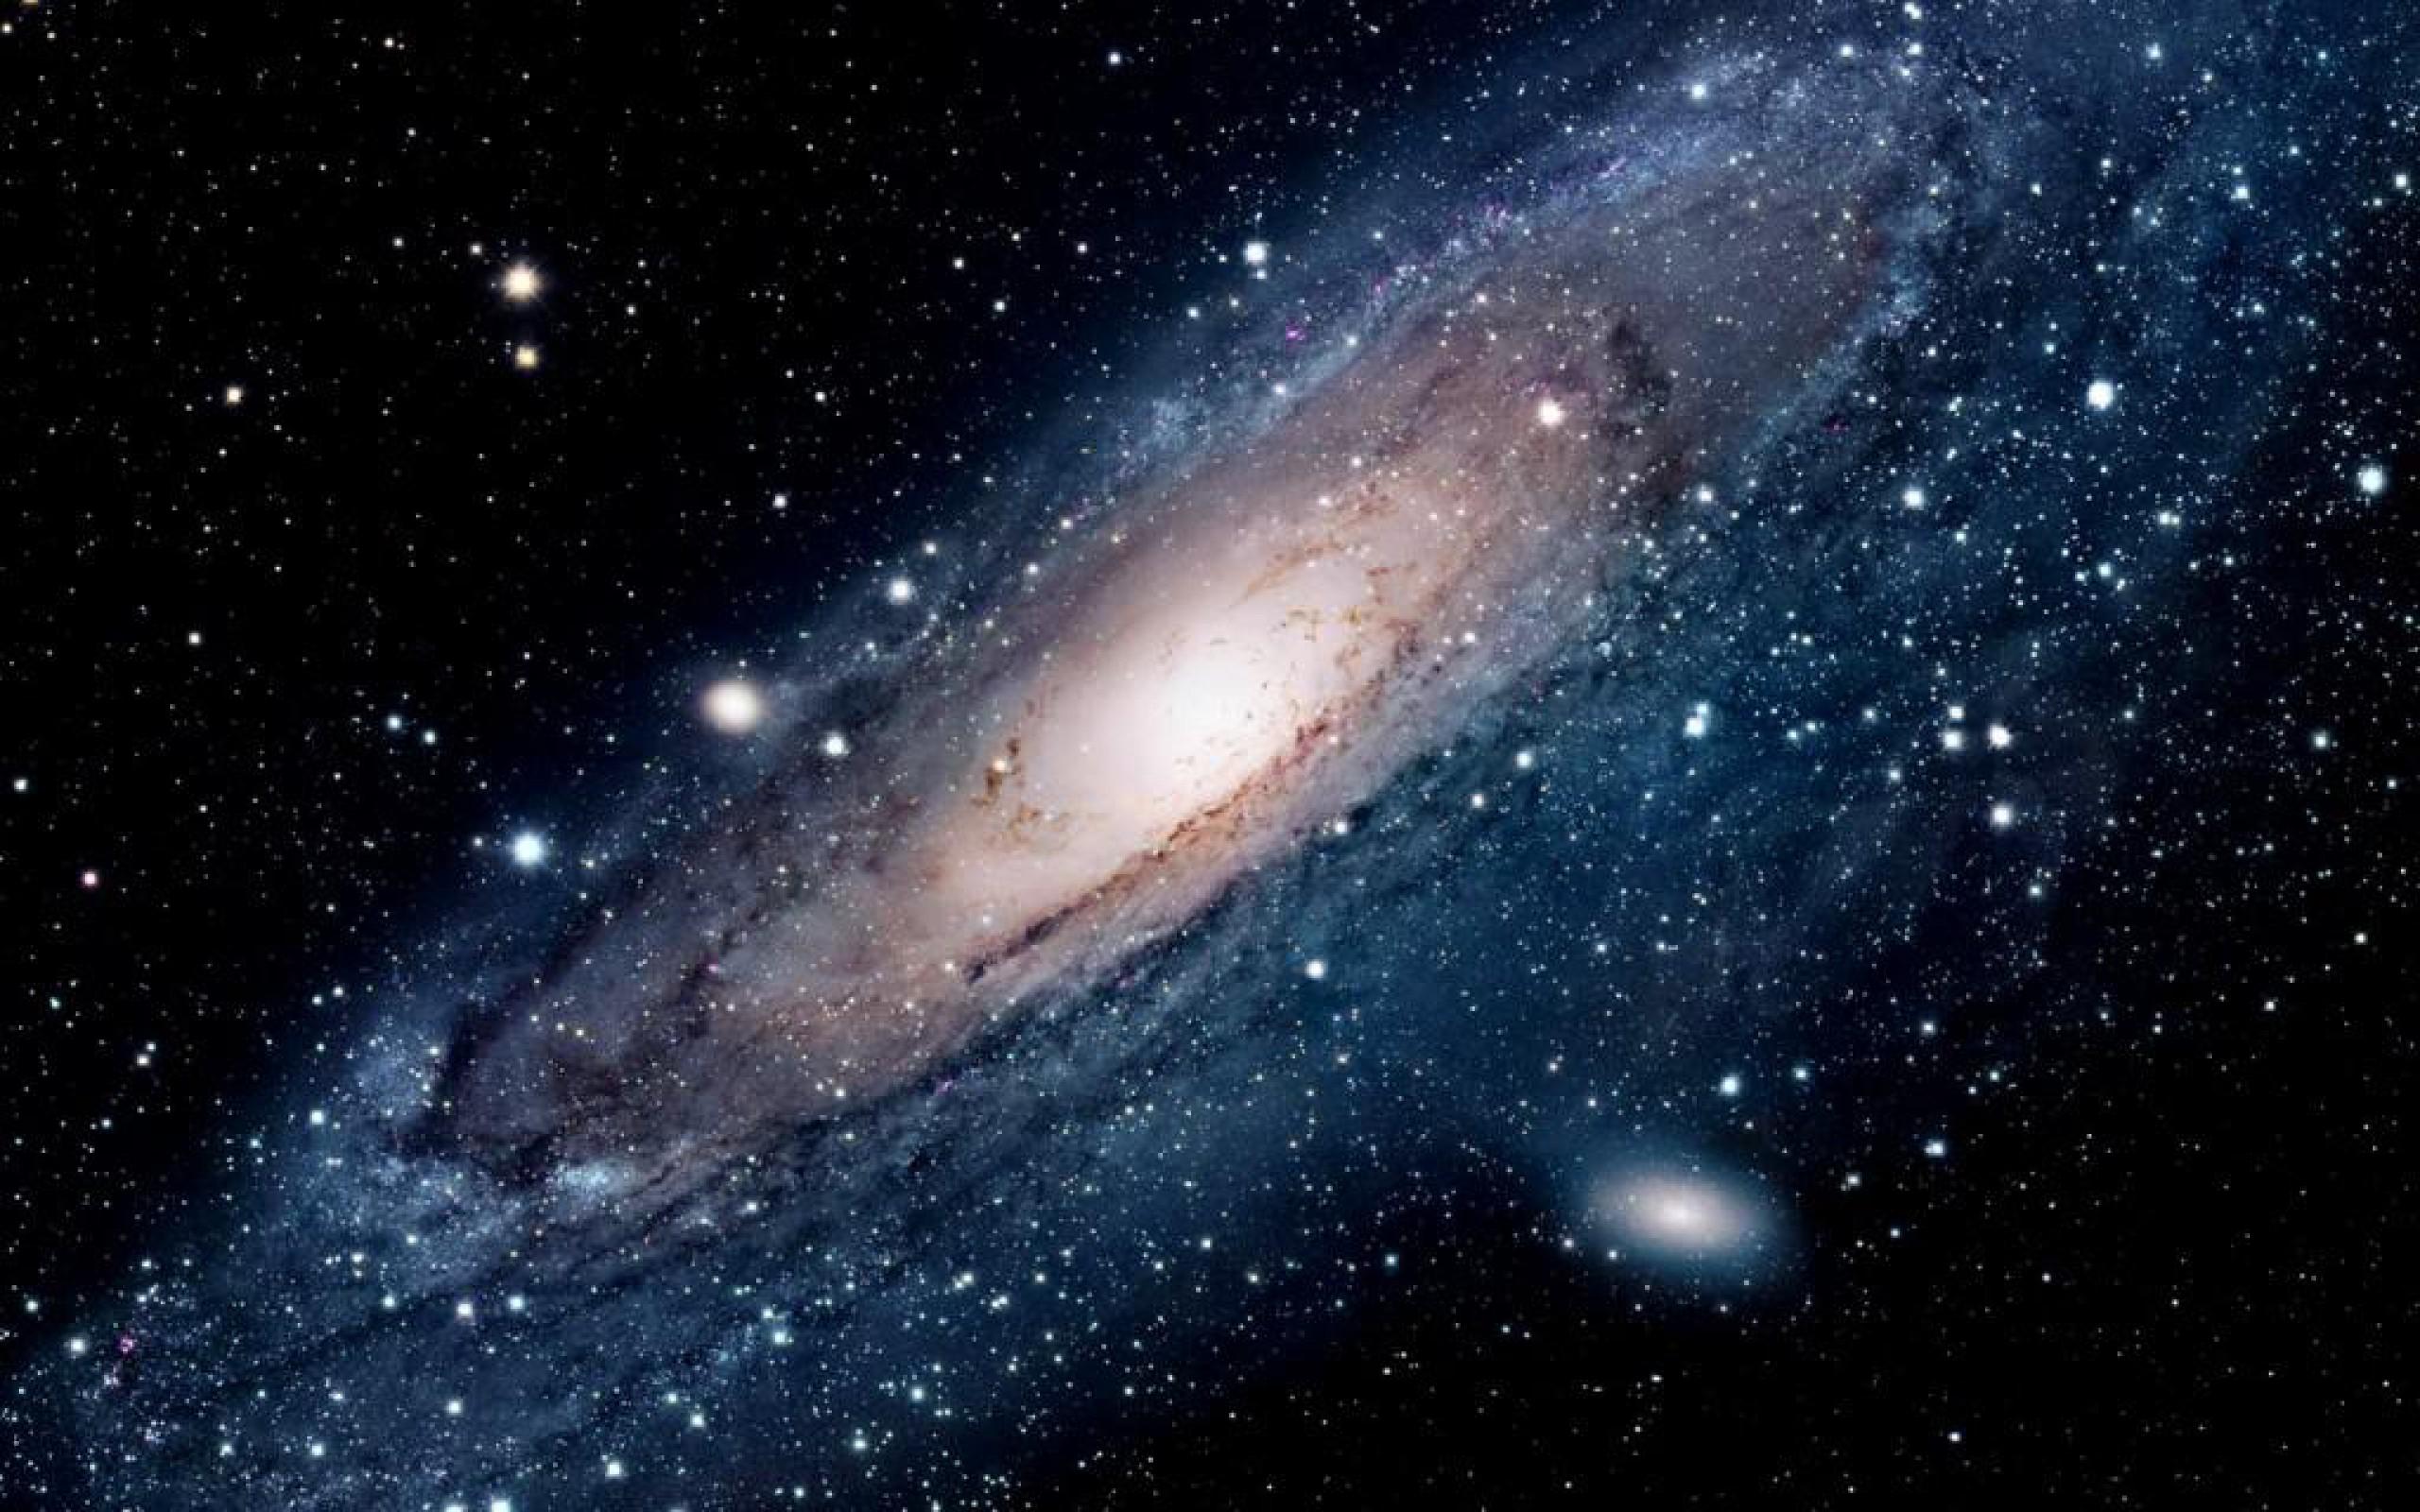 Andromeda Galaxy Wallpaper HD - WallpaperSafari